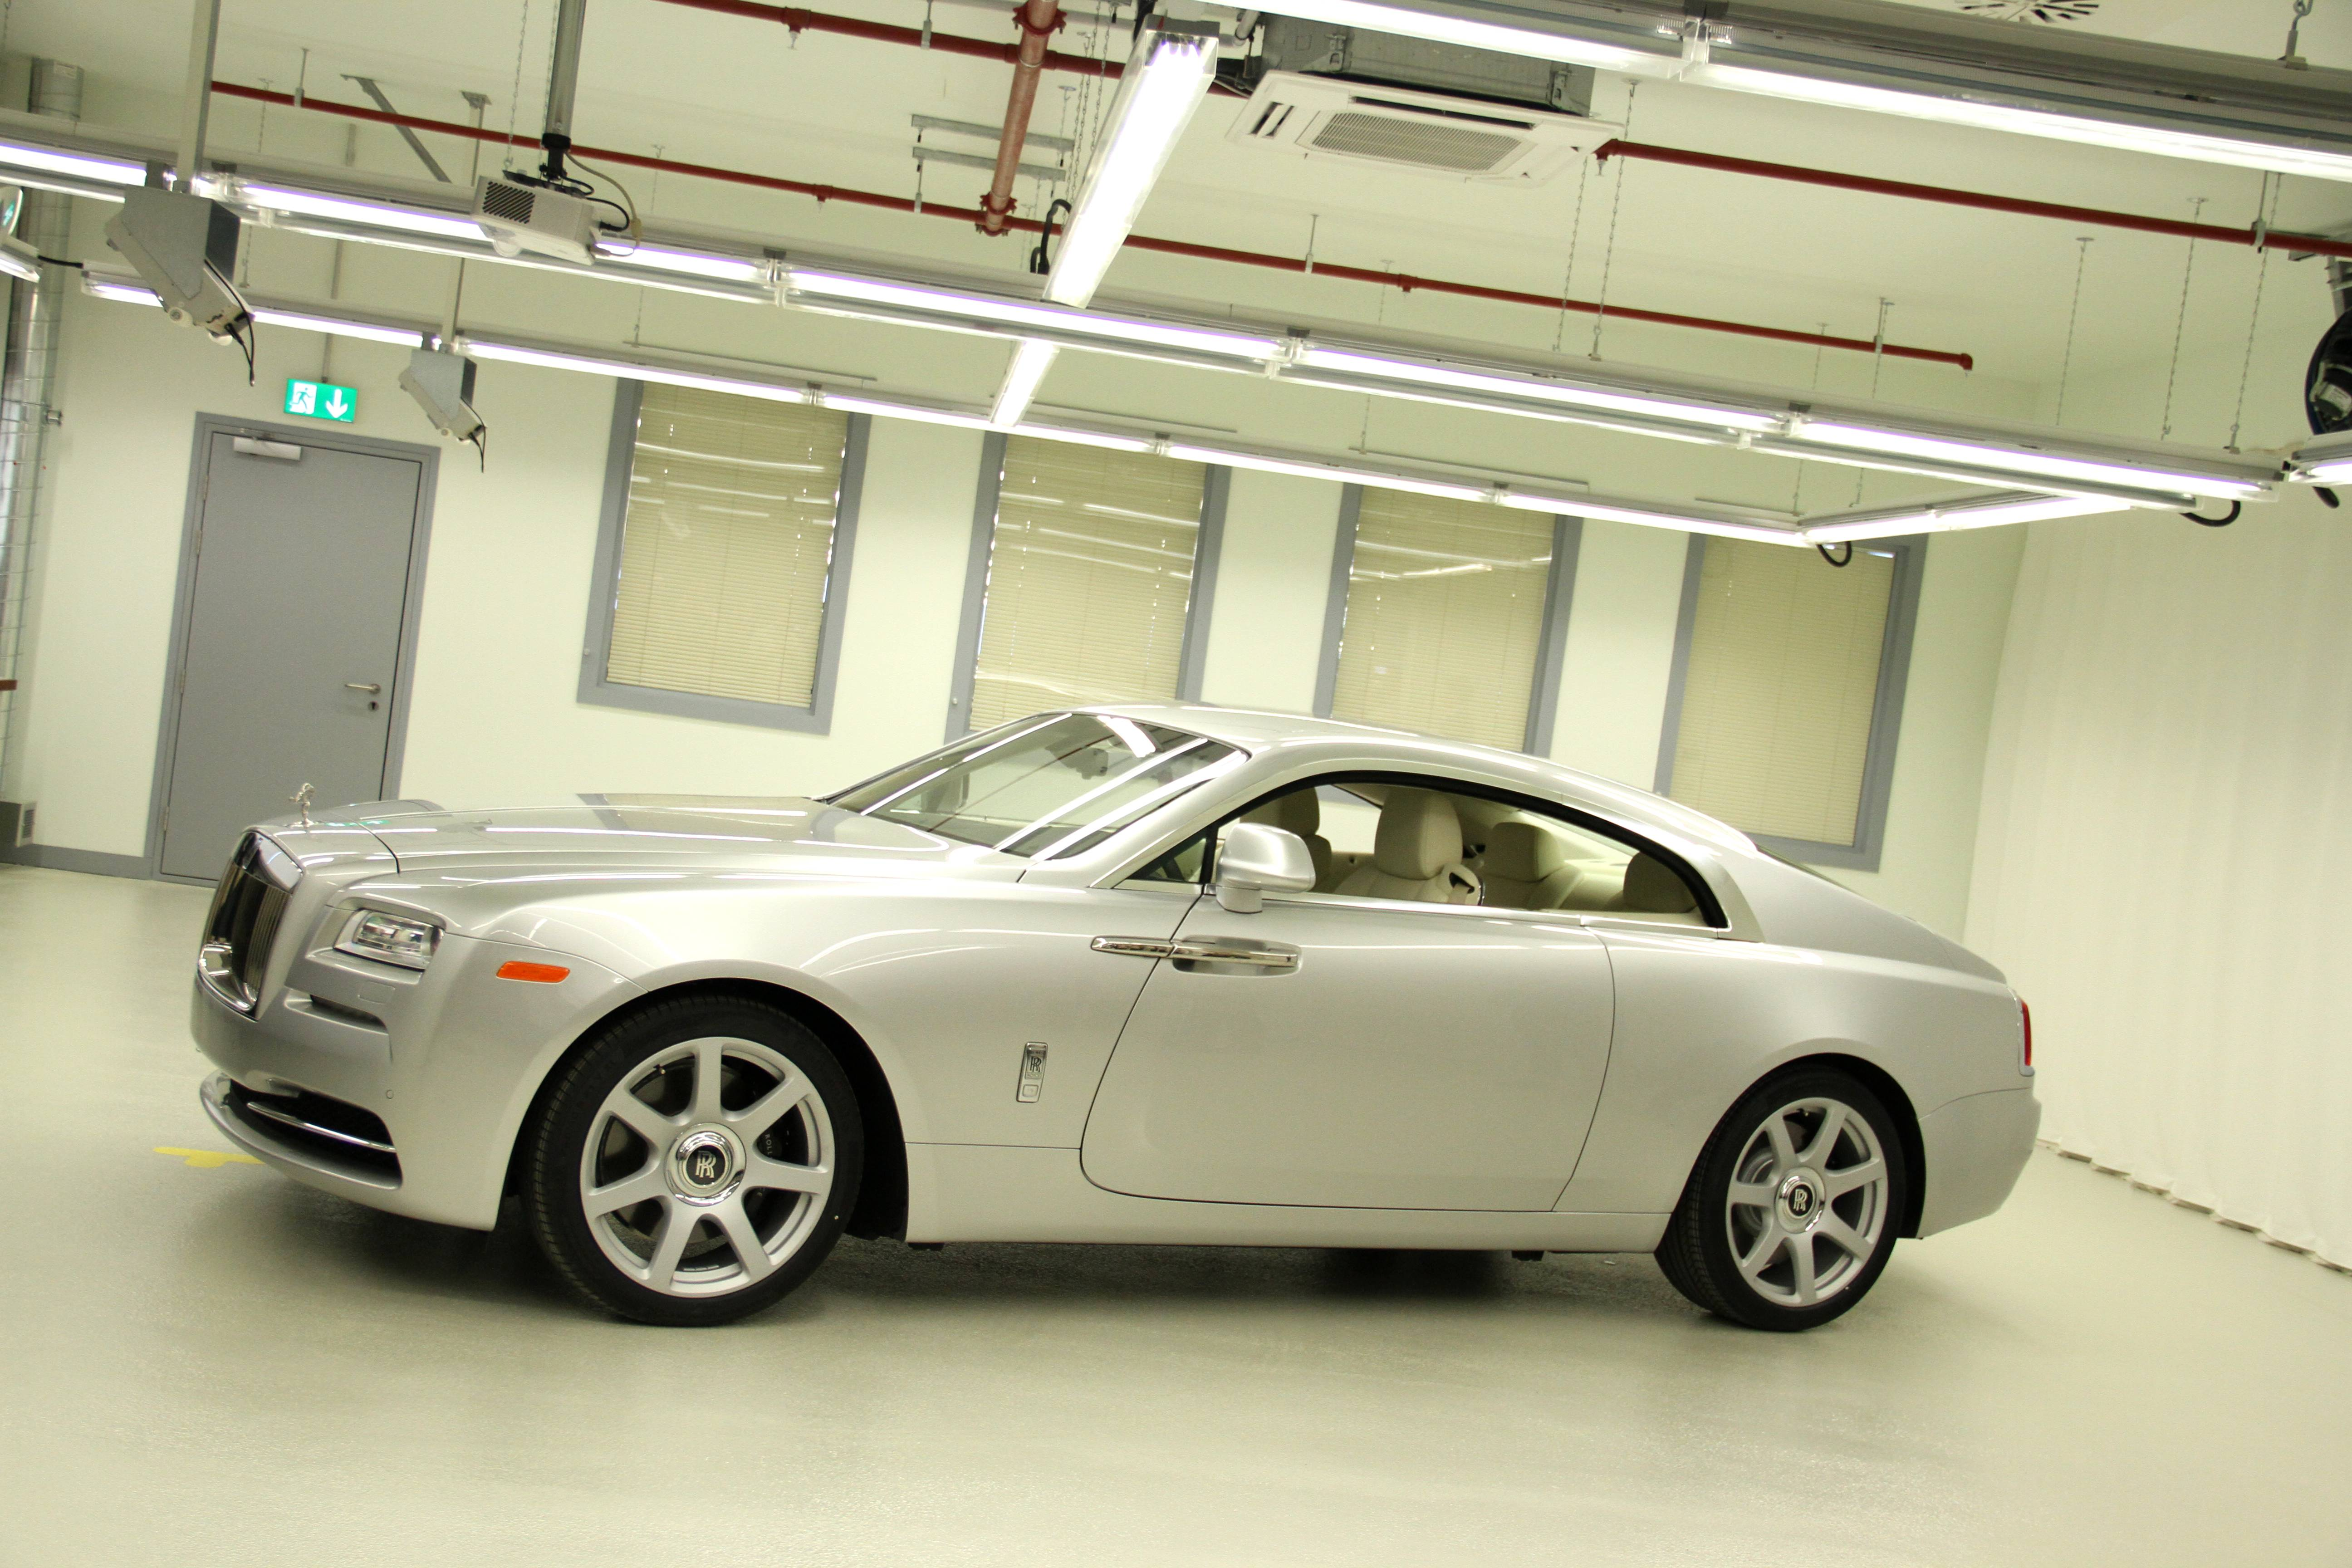 Rolls Royce Wraith Profile